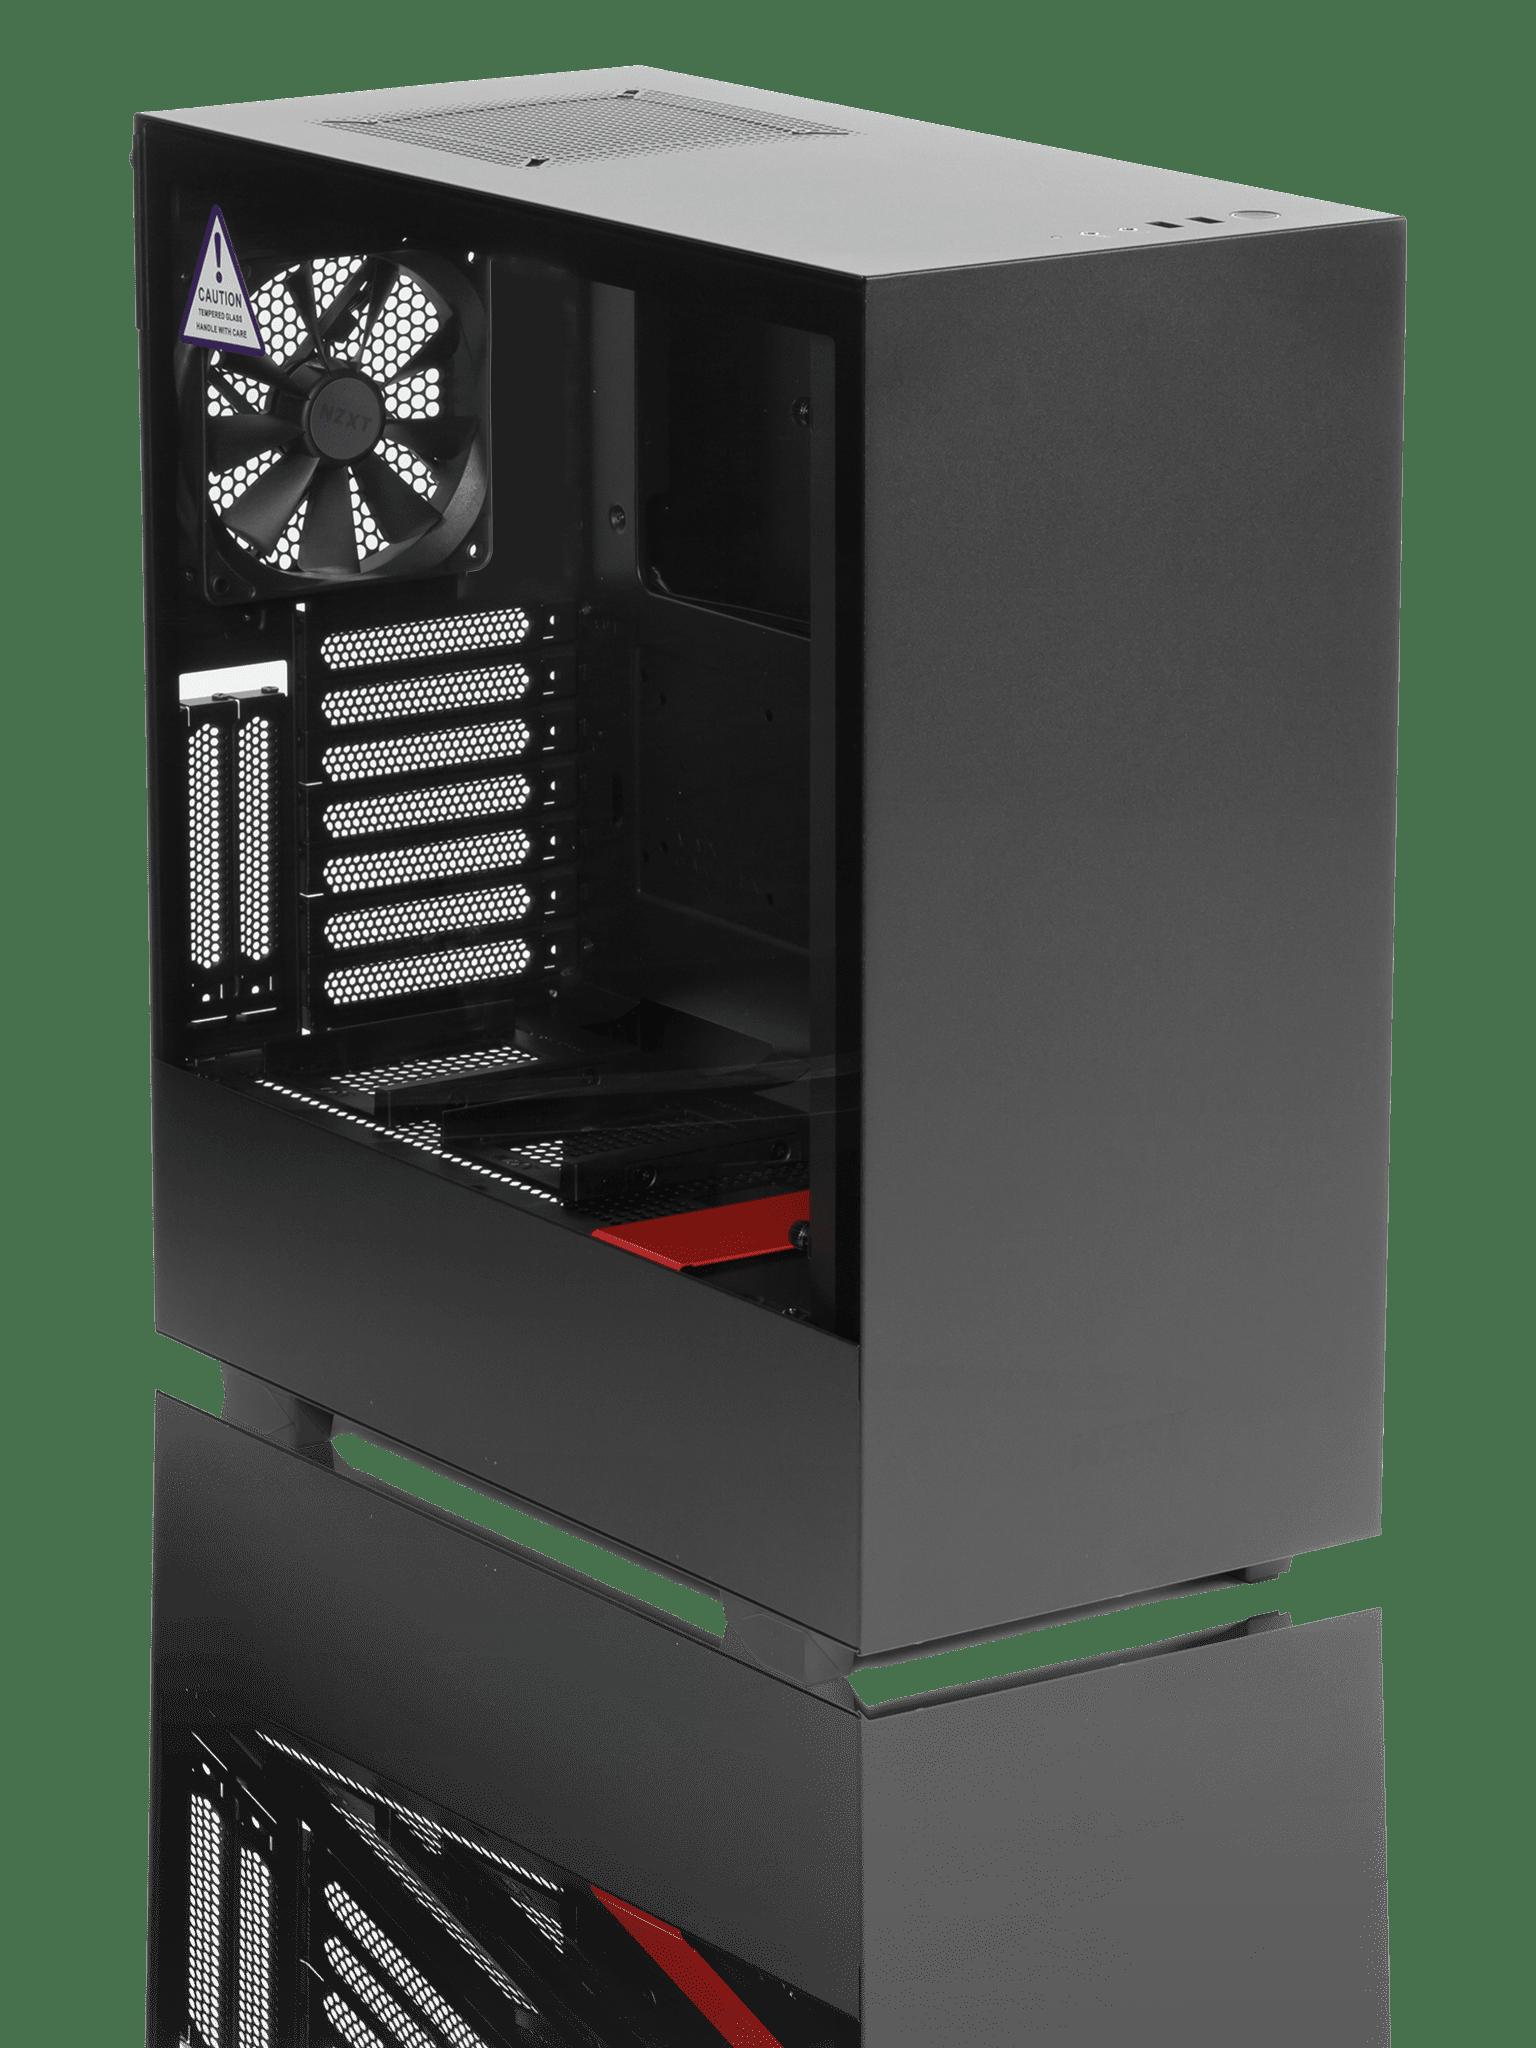 LYTE Master PC - Ryzen 5 | GTX 1060 6GB | 8GB DDR4 | ASUS Prime A320M